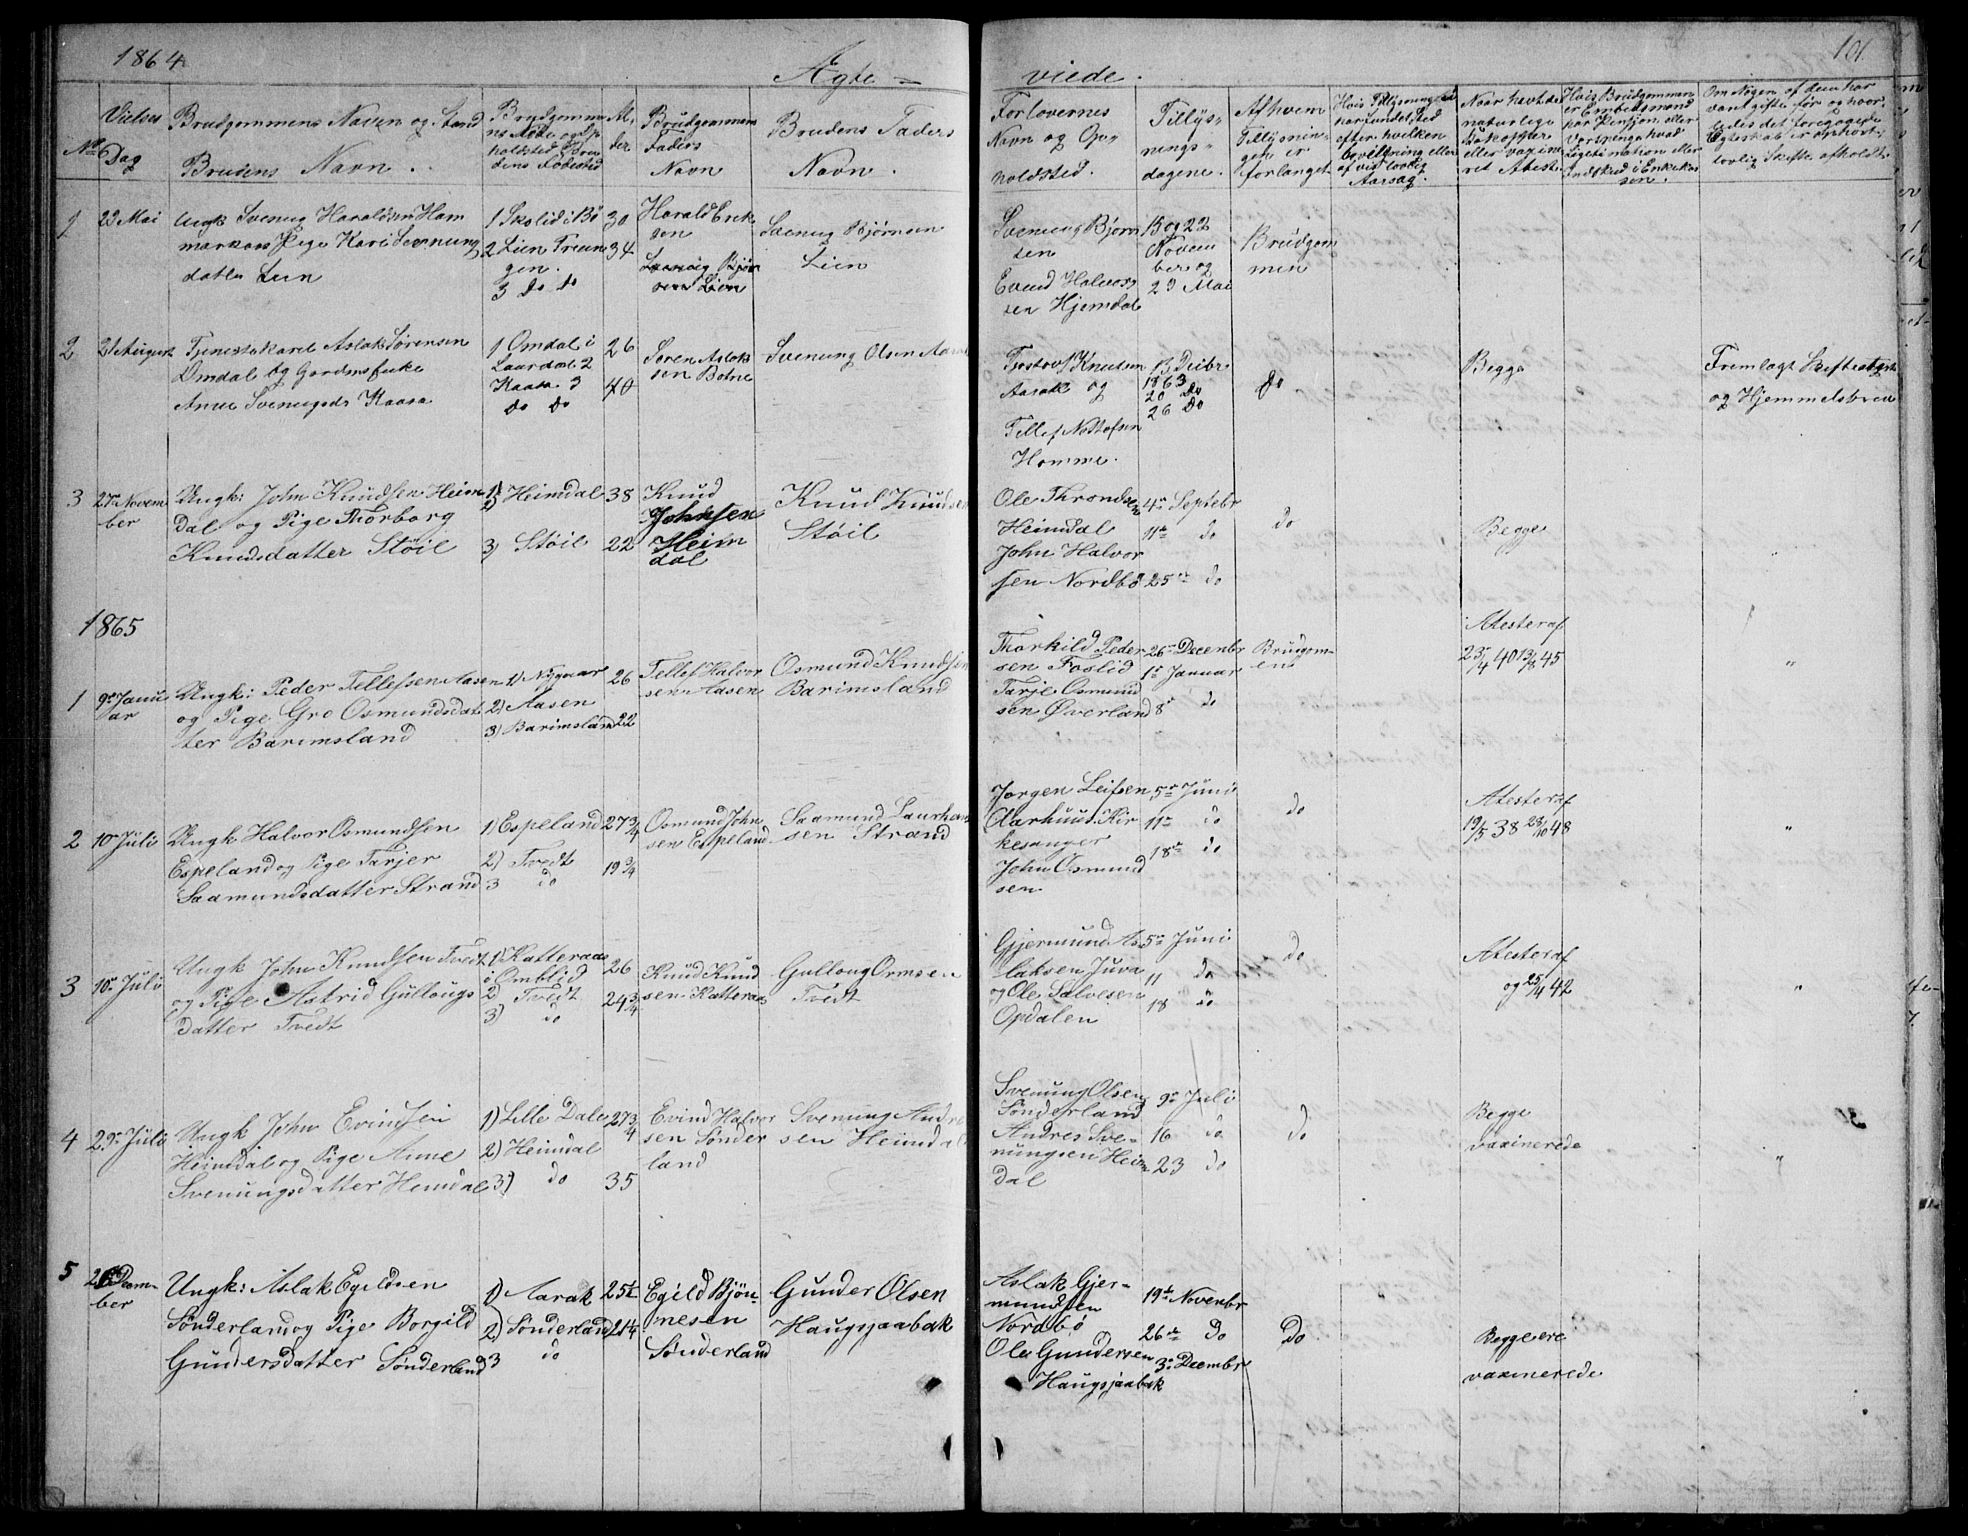 SAKO, Nissedal kirkebøker, G/Gb/L0002: Klokkerbok nr. II 2, 1863-1892, s. 101